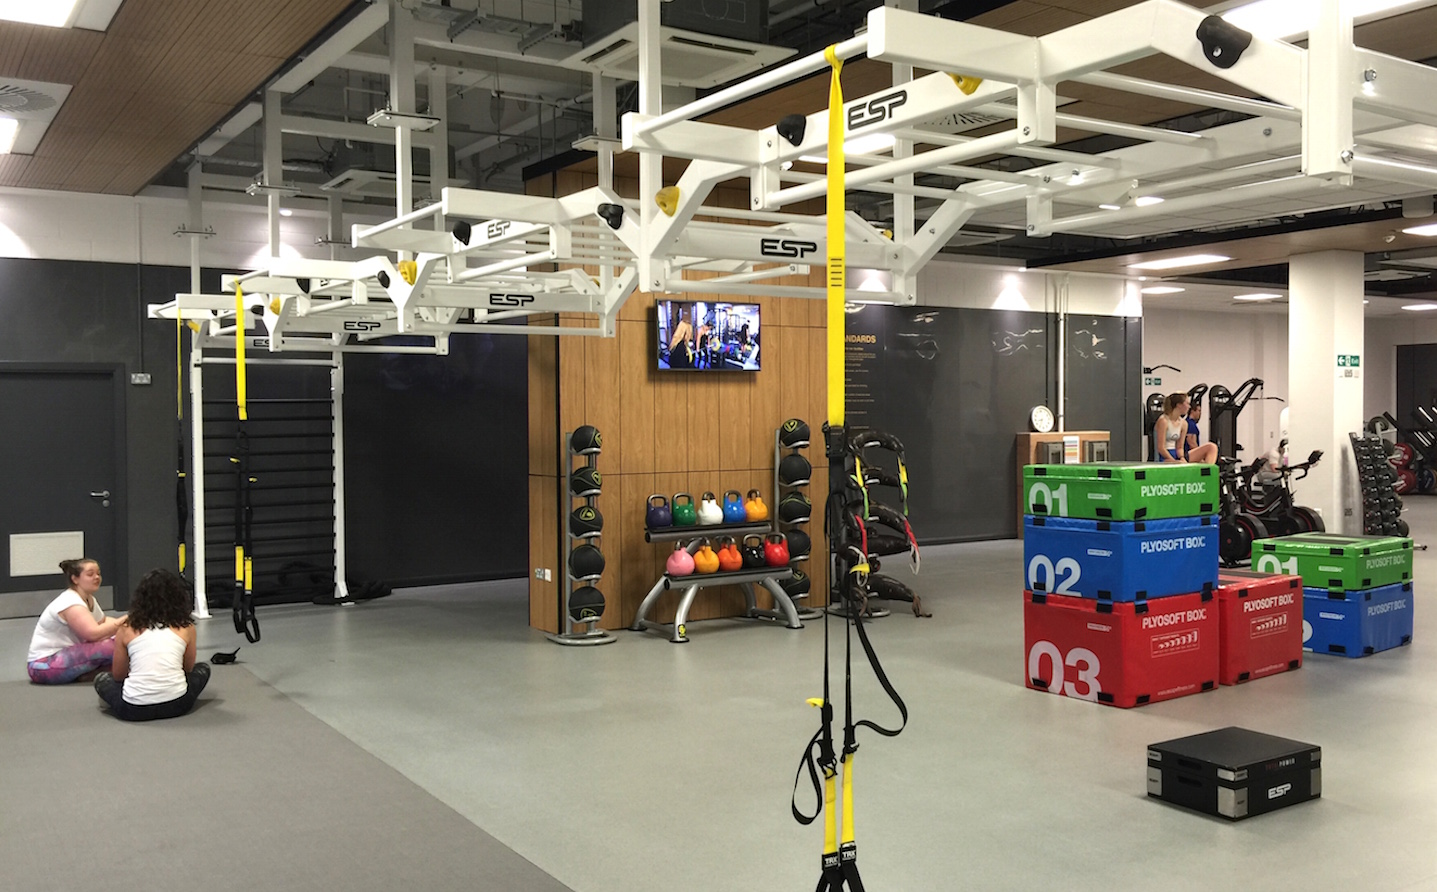 University Of Glasgow Esp Fitness